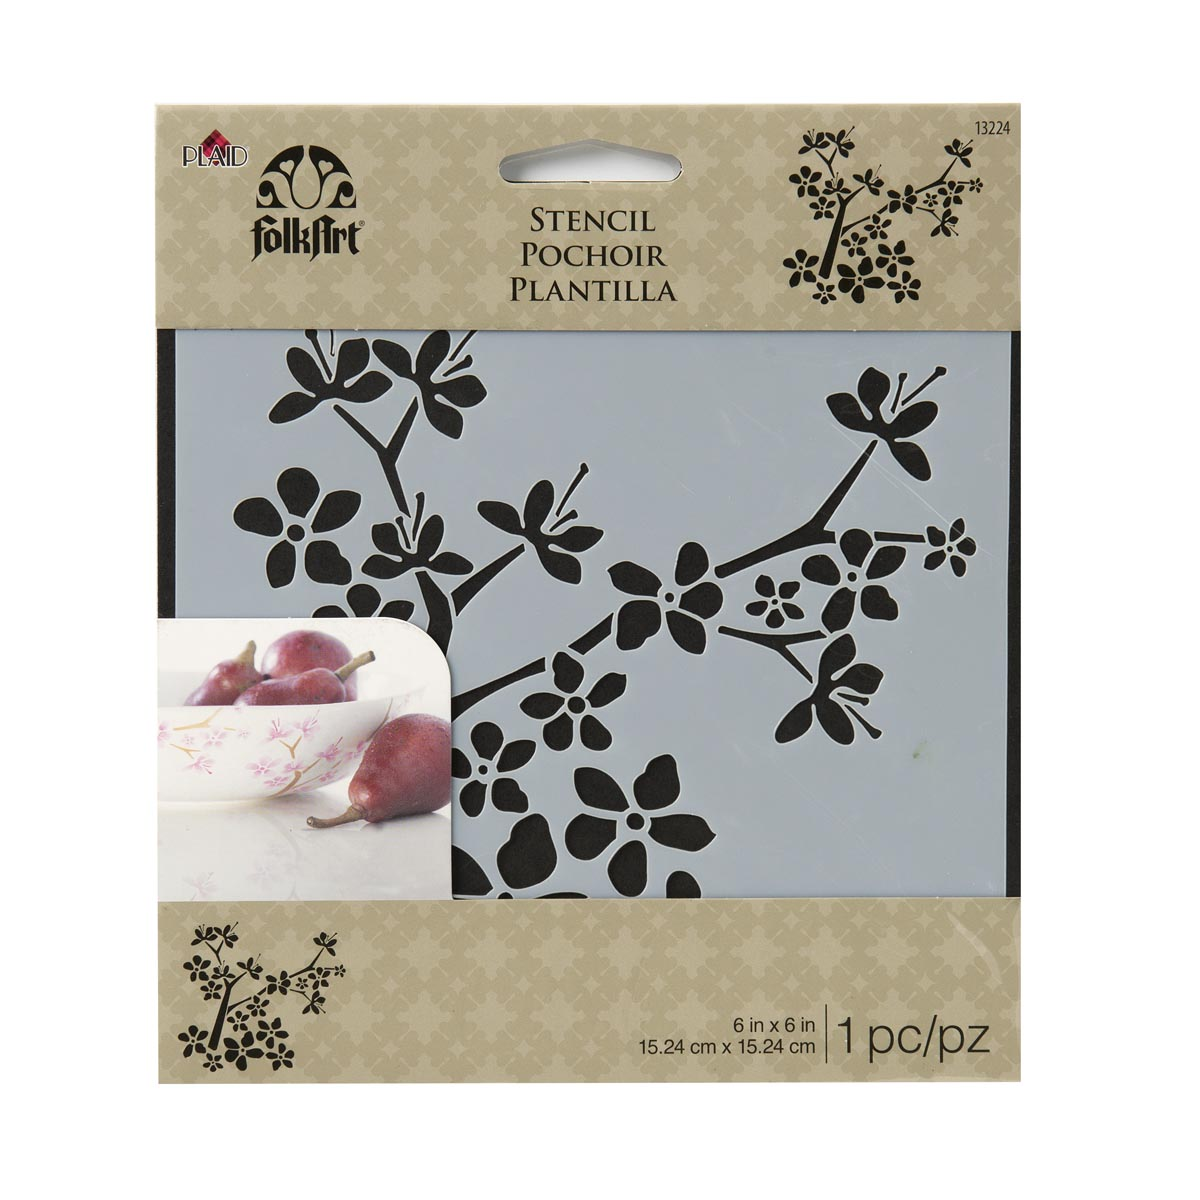 FolkArt ® Painting Stencils - Small - Cherry Blossom